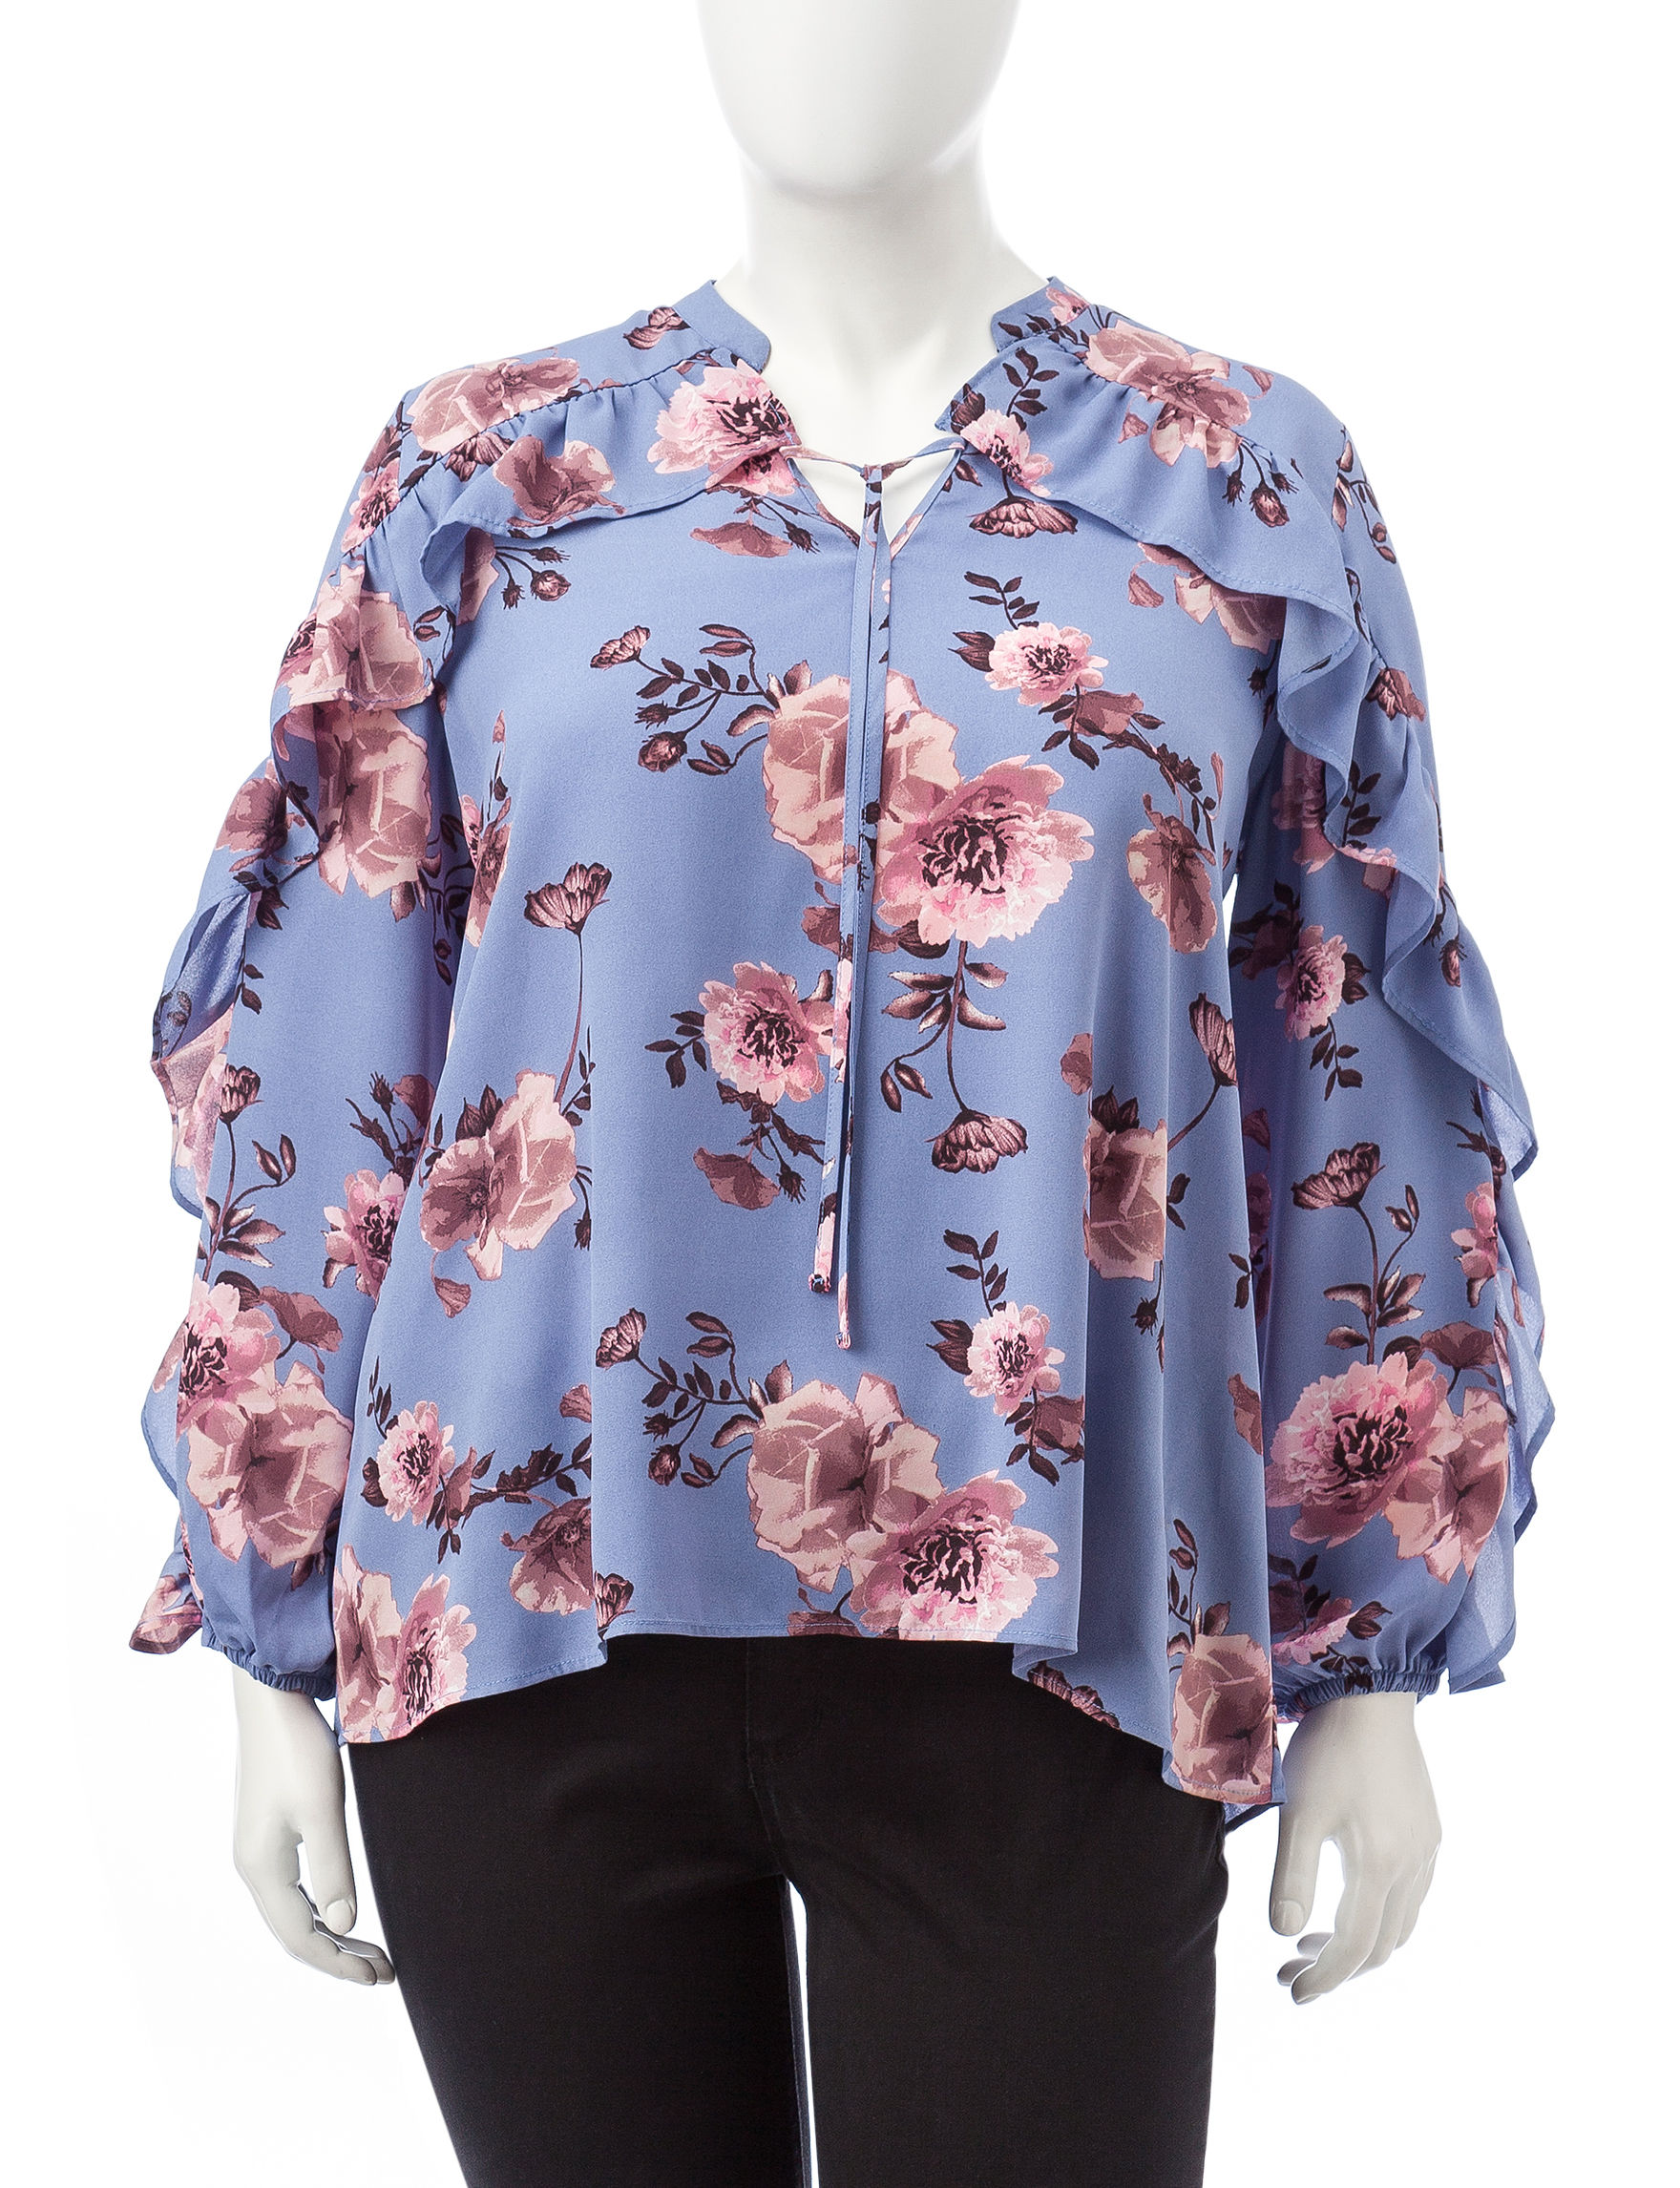 Justify Lavender Shirts & Blouses